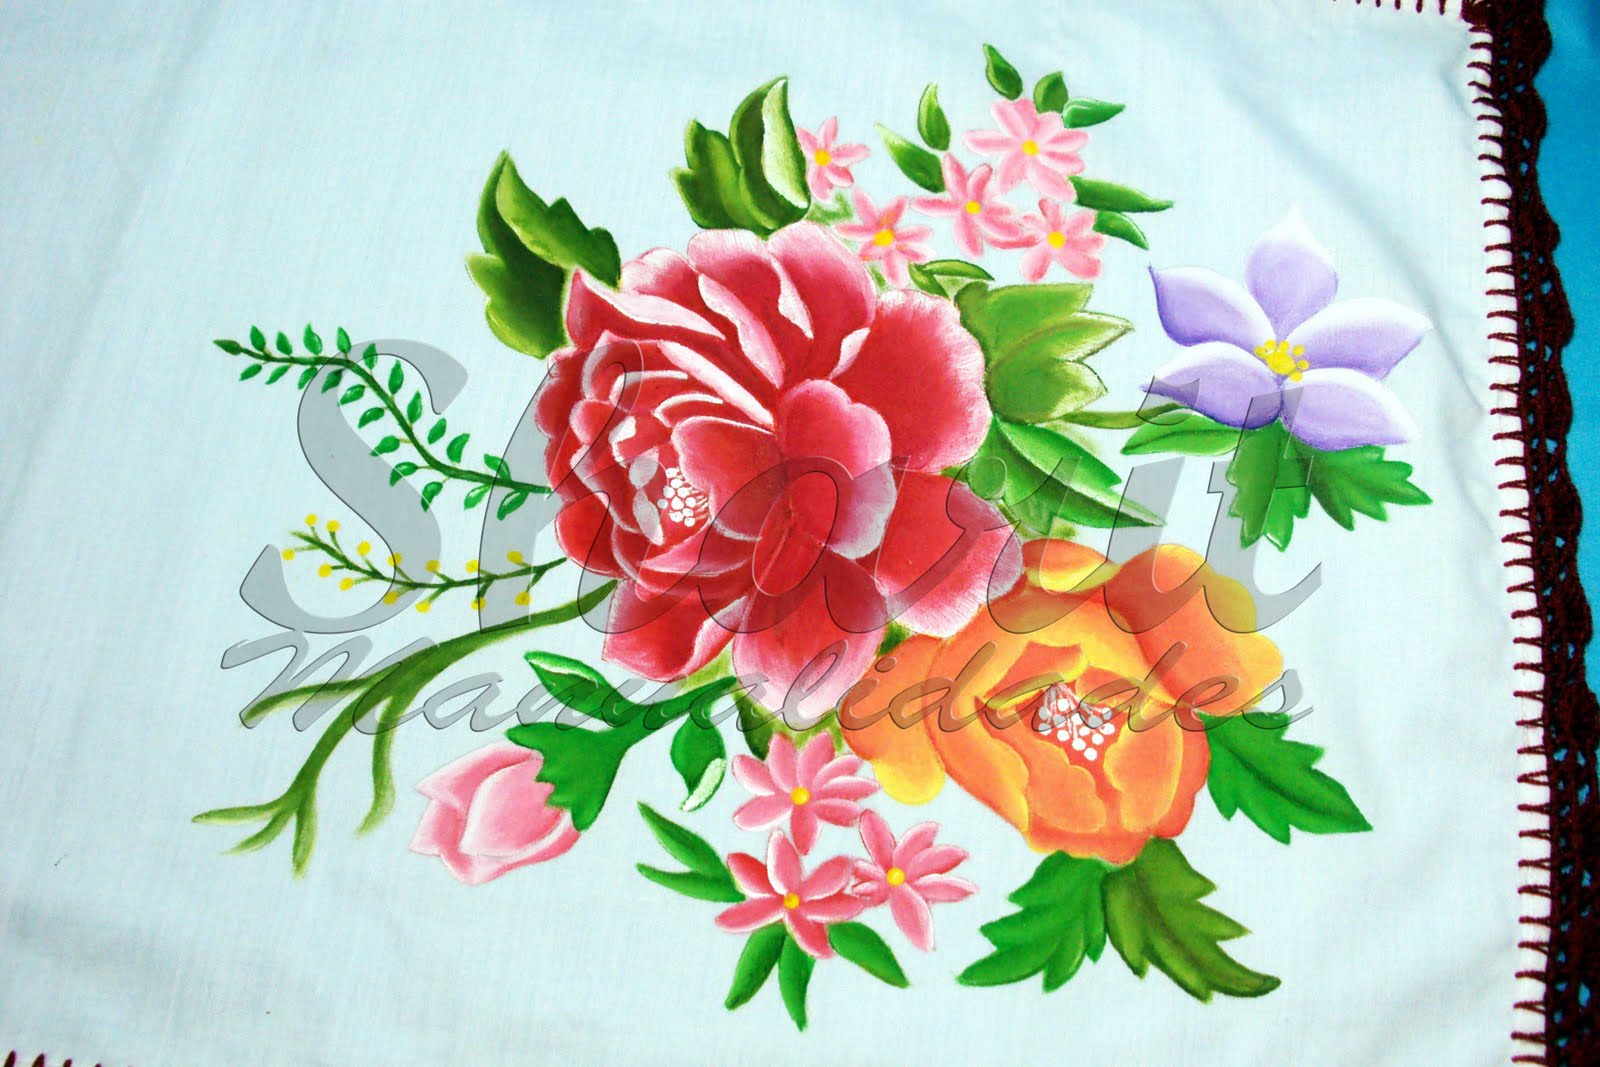 Sharit manualidades y mas camino de mesa pintado en tela - Dibujos para pintar en tela ...